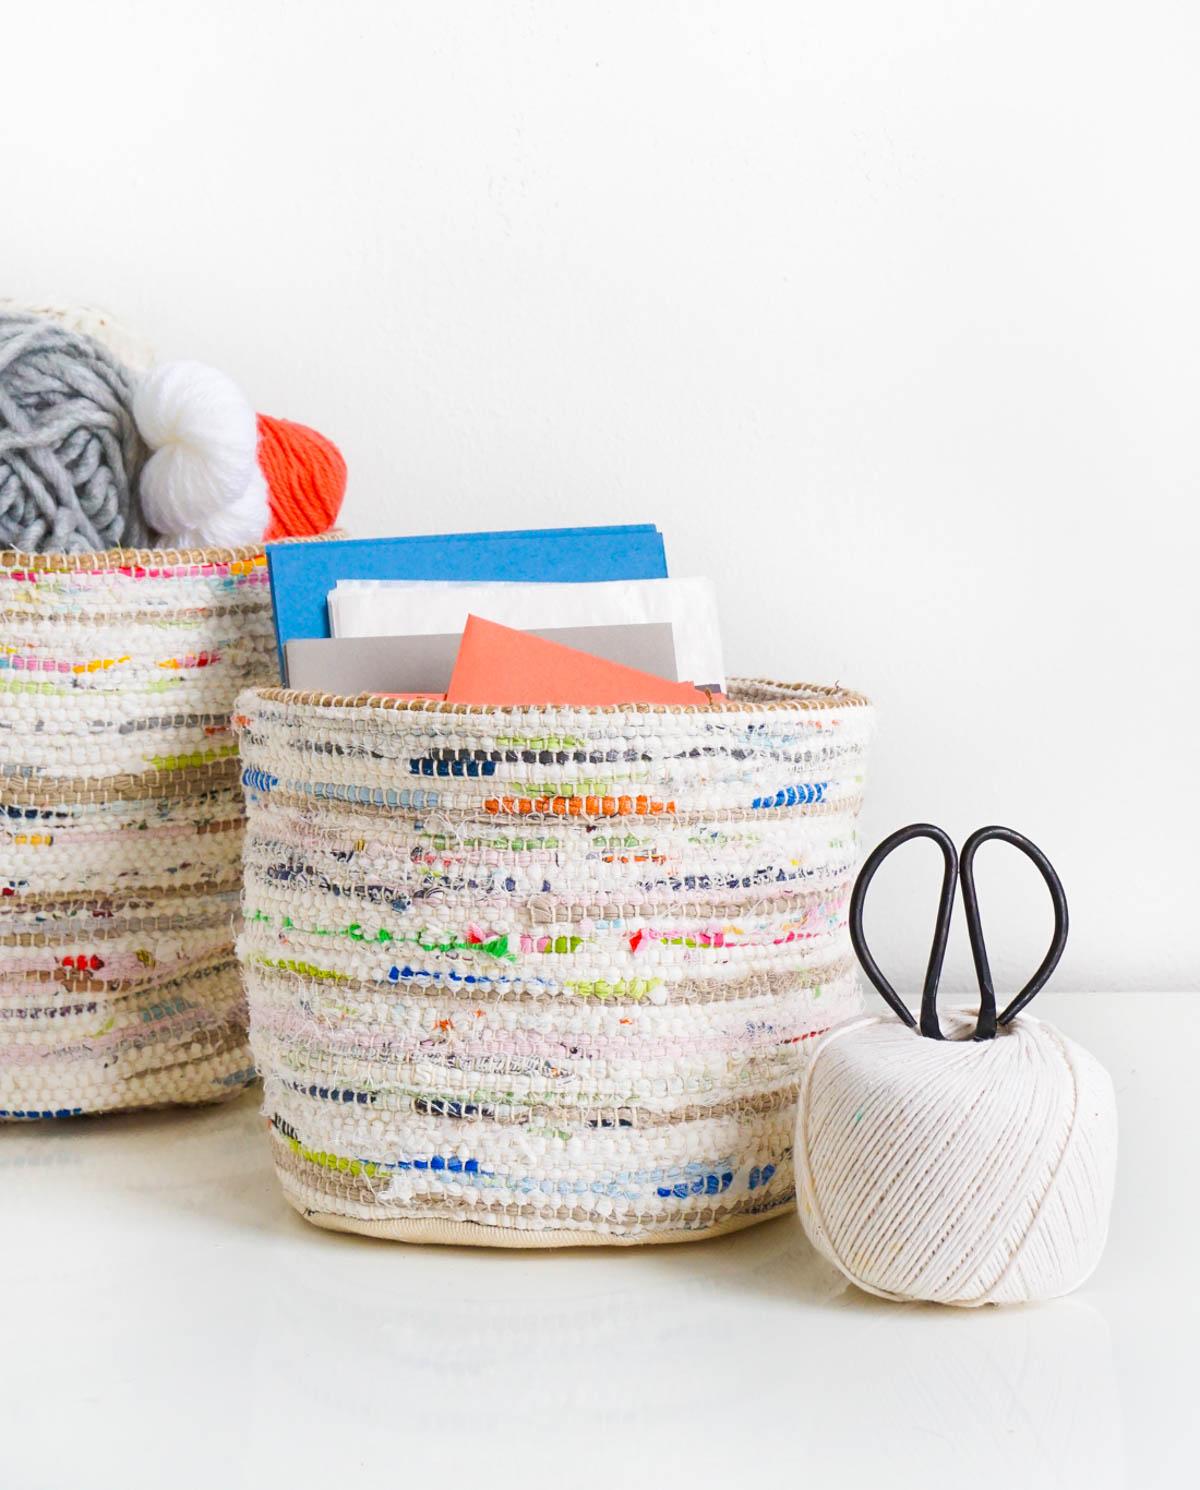 diy-textile-tote-erin-17